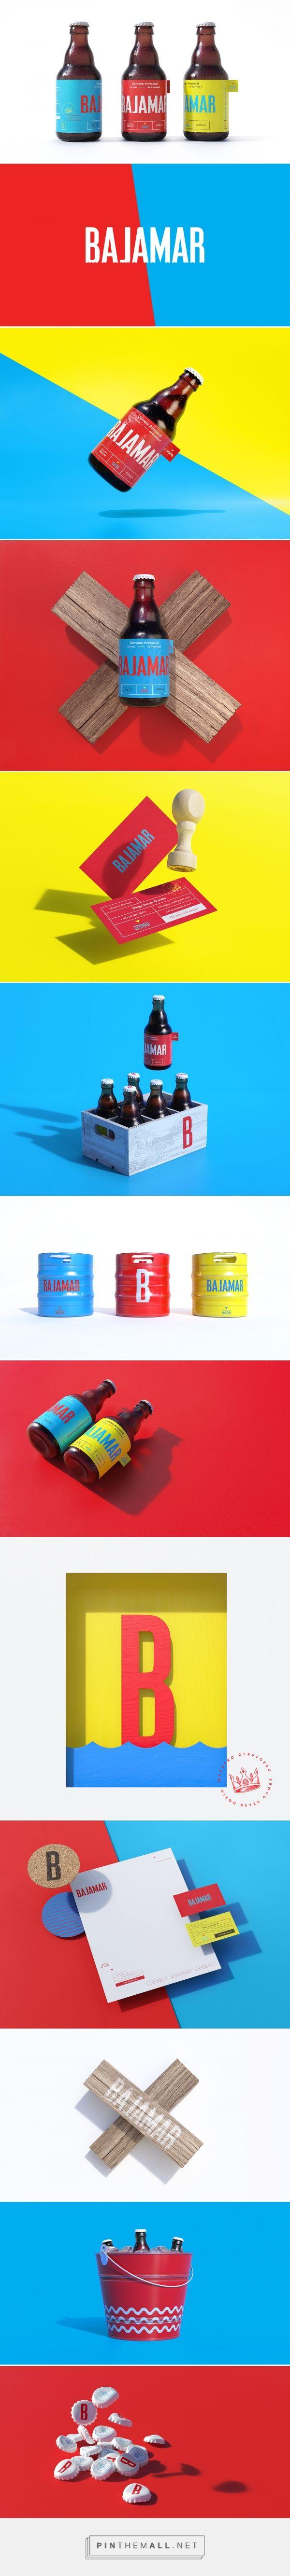 Bajamar beer packaging design by Shift - https://www.packagingoftheworld.com/2018/02/bajamar.html